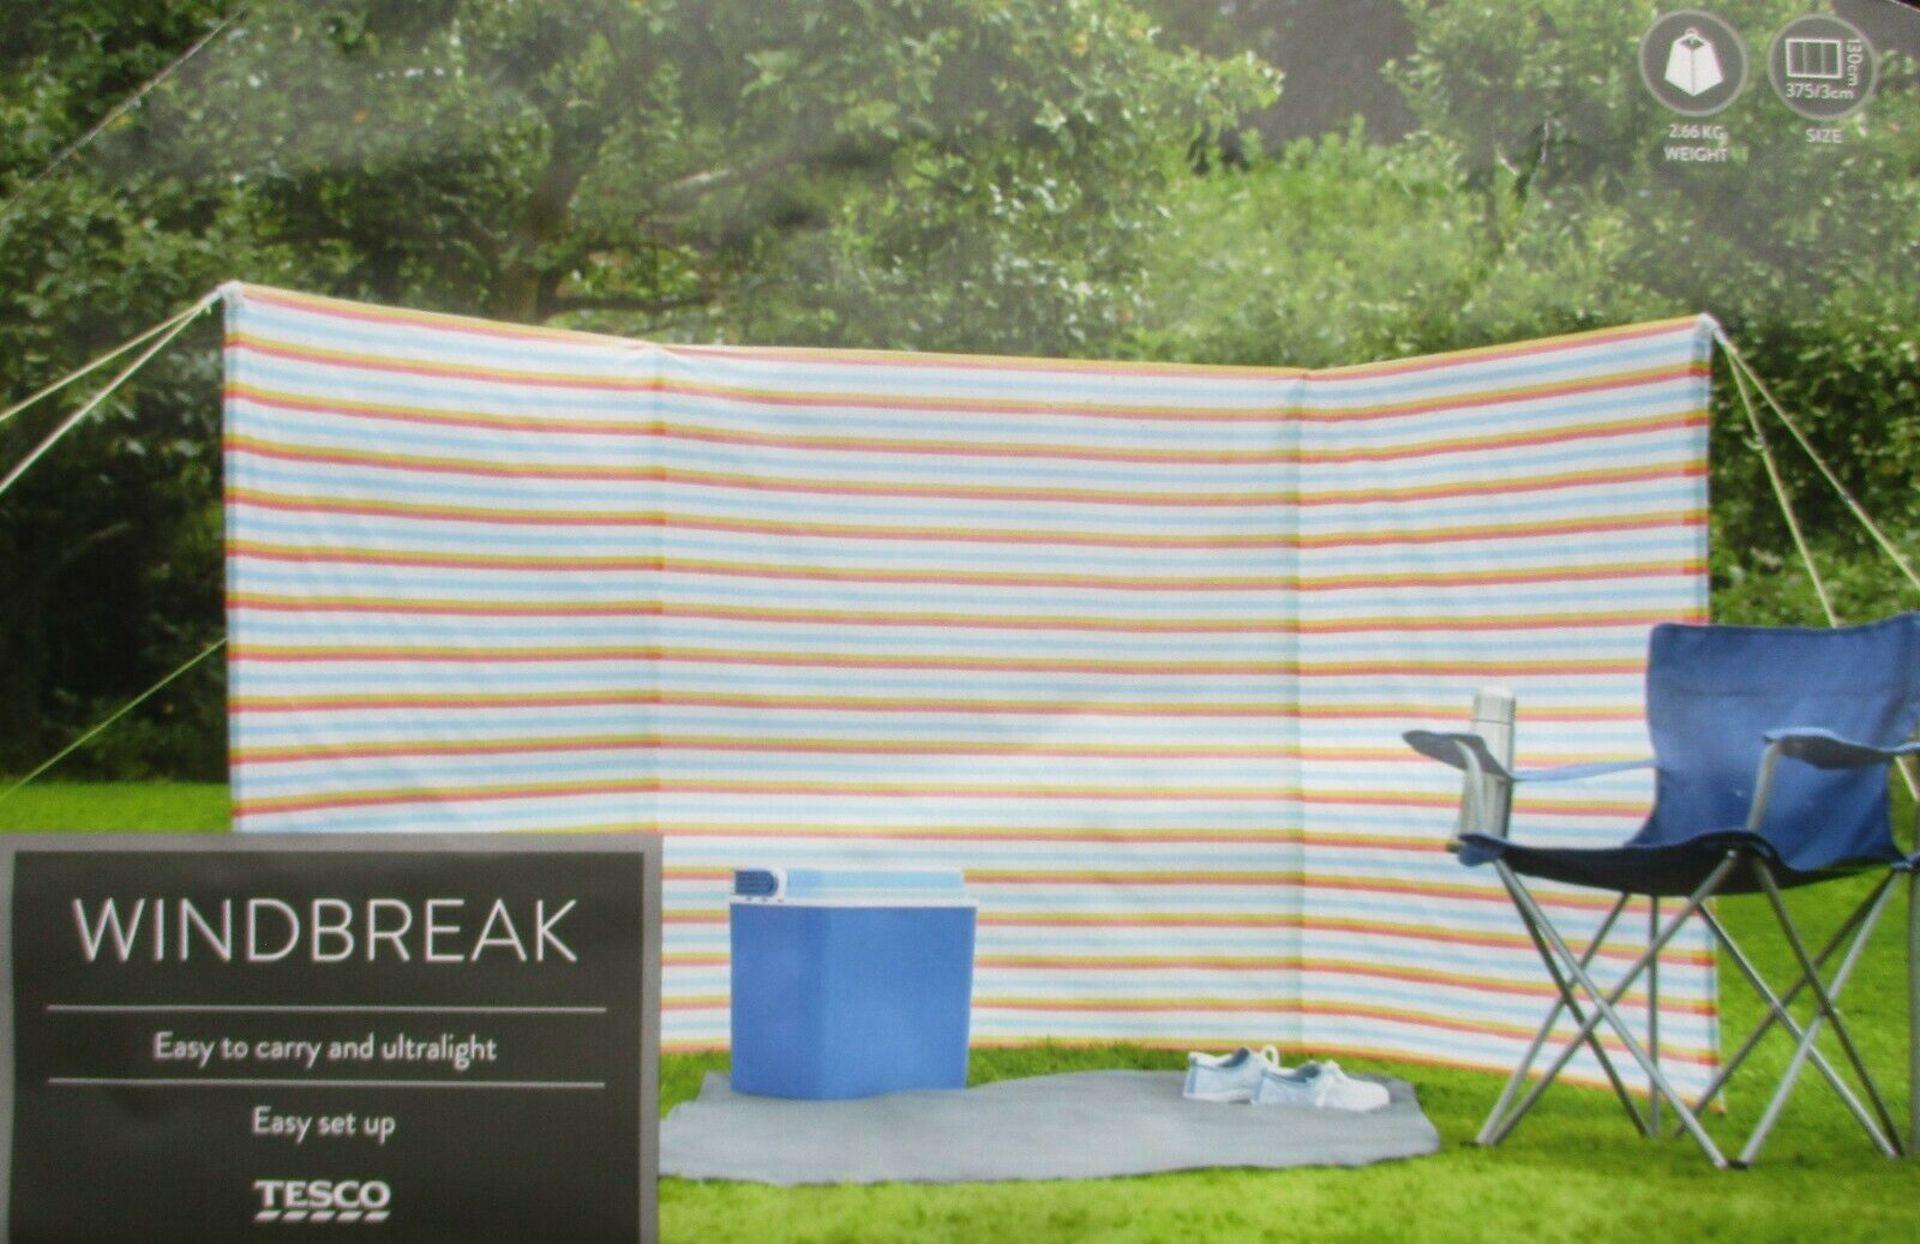 Brand New Tesco Windbreak 3.75M x 1.3M Lightweight Ideal For Camping & Caravanning Beach